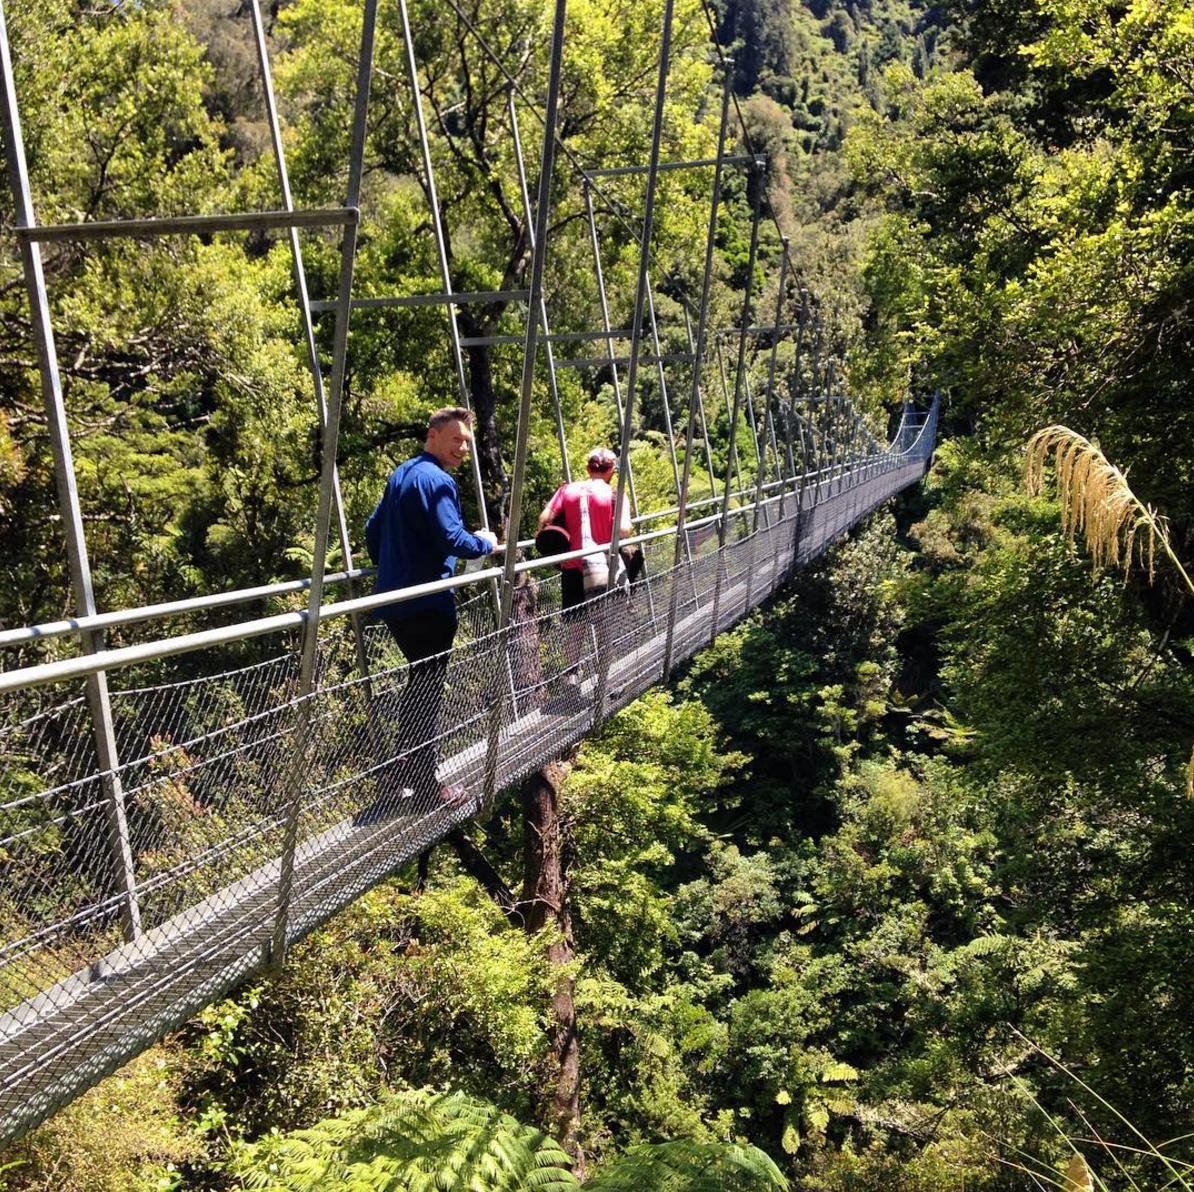 Crossing the swingbridge across the Waiohine Gorge.